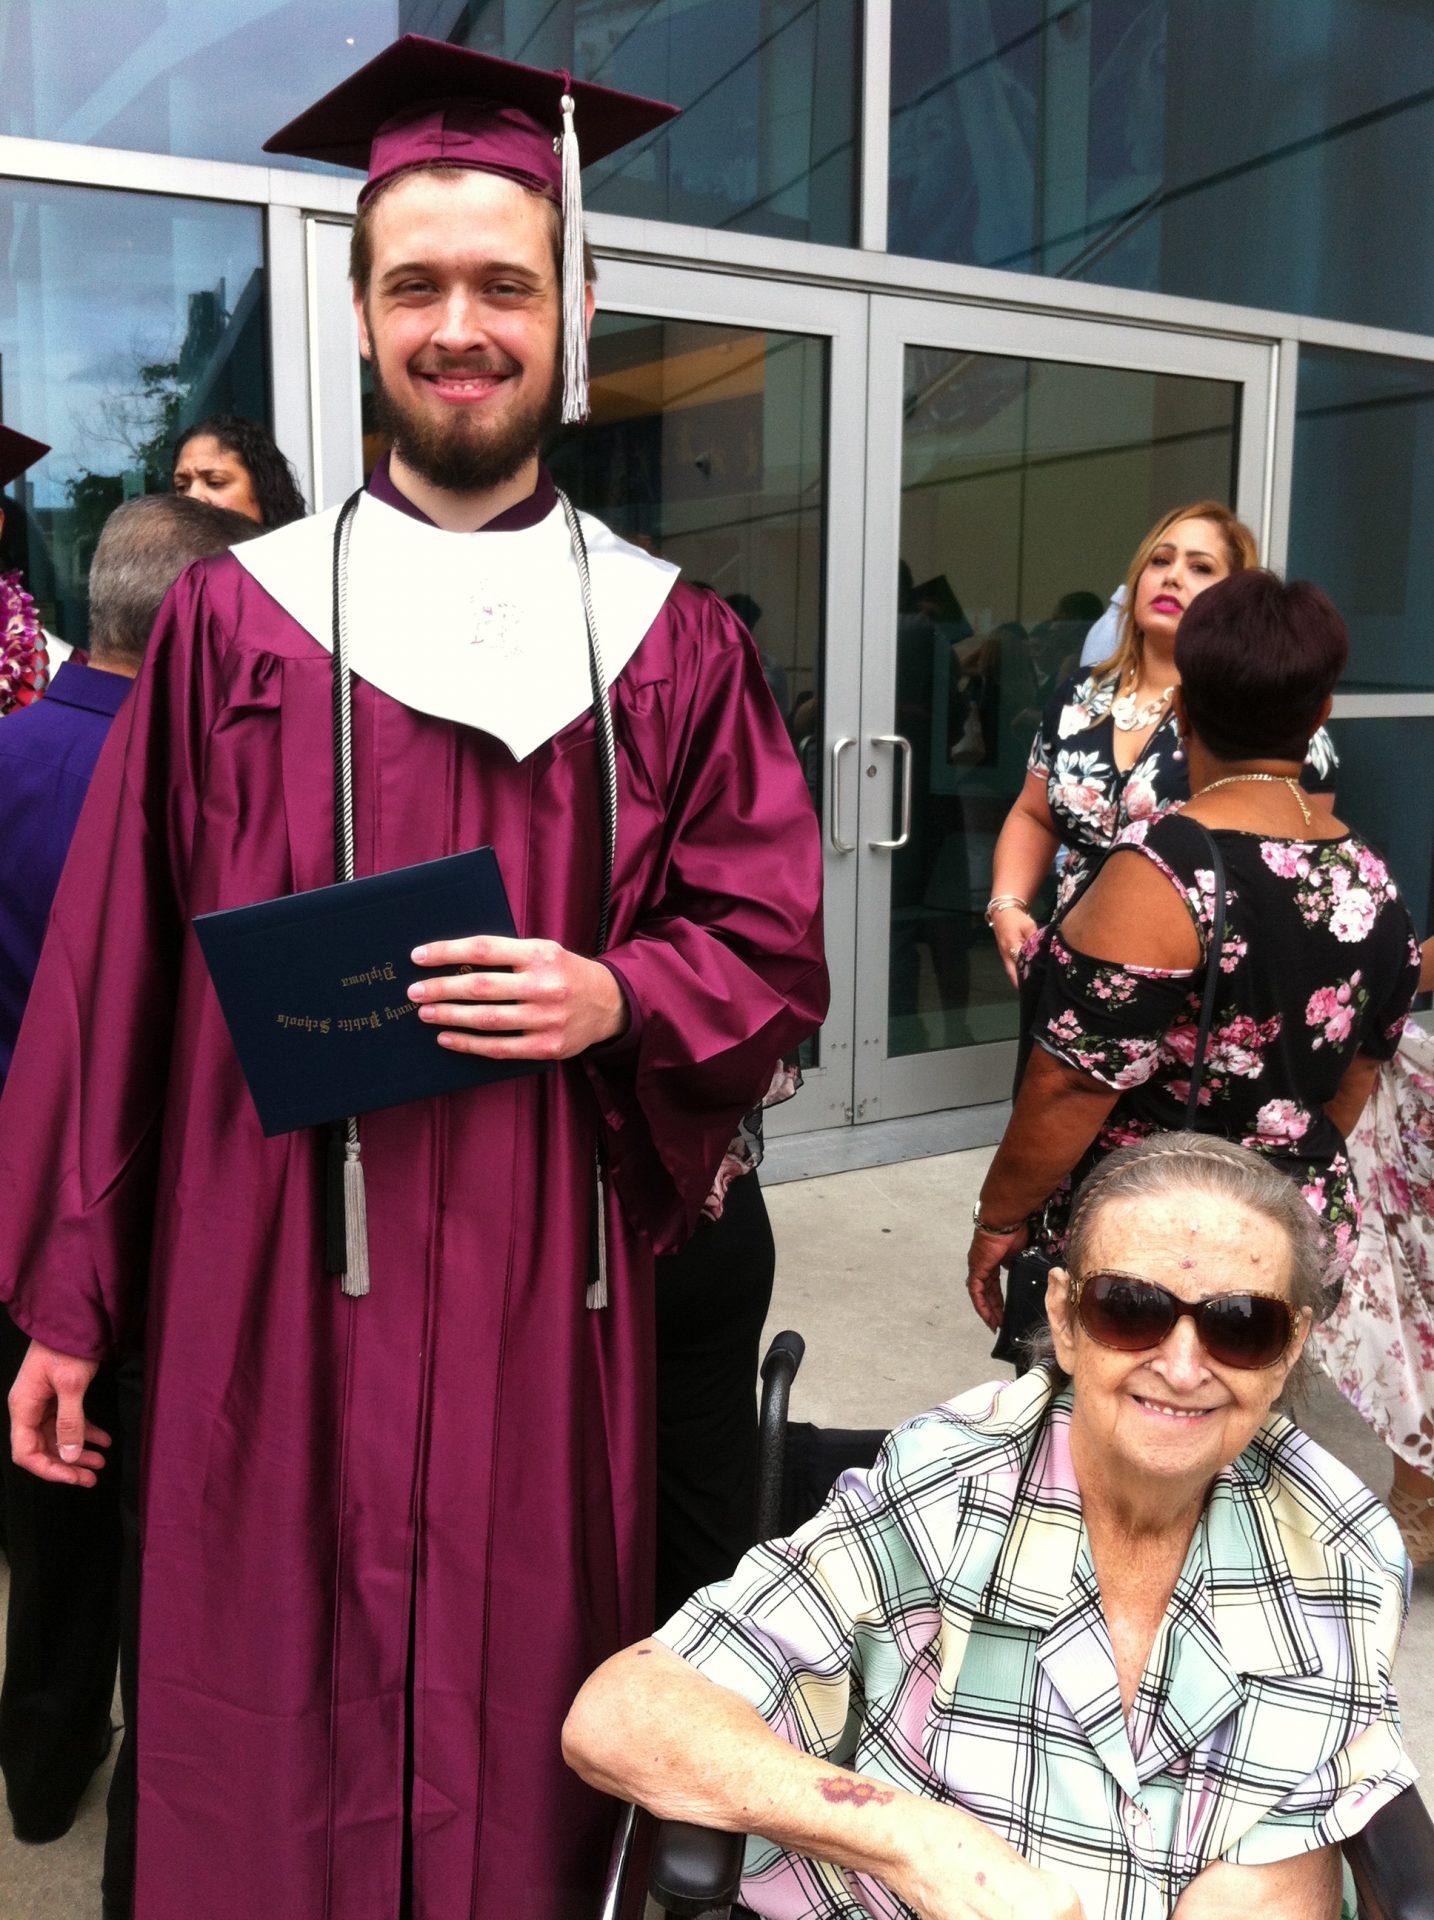 Graduation from high school